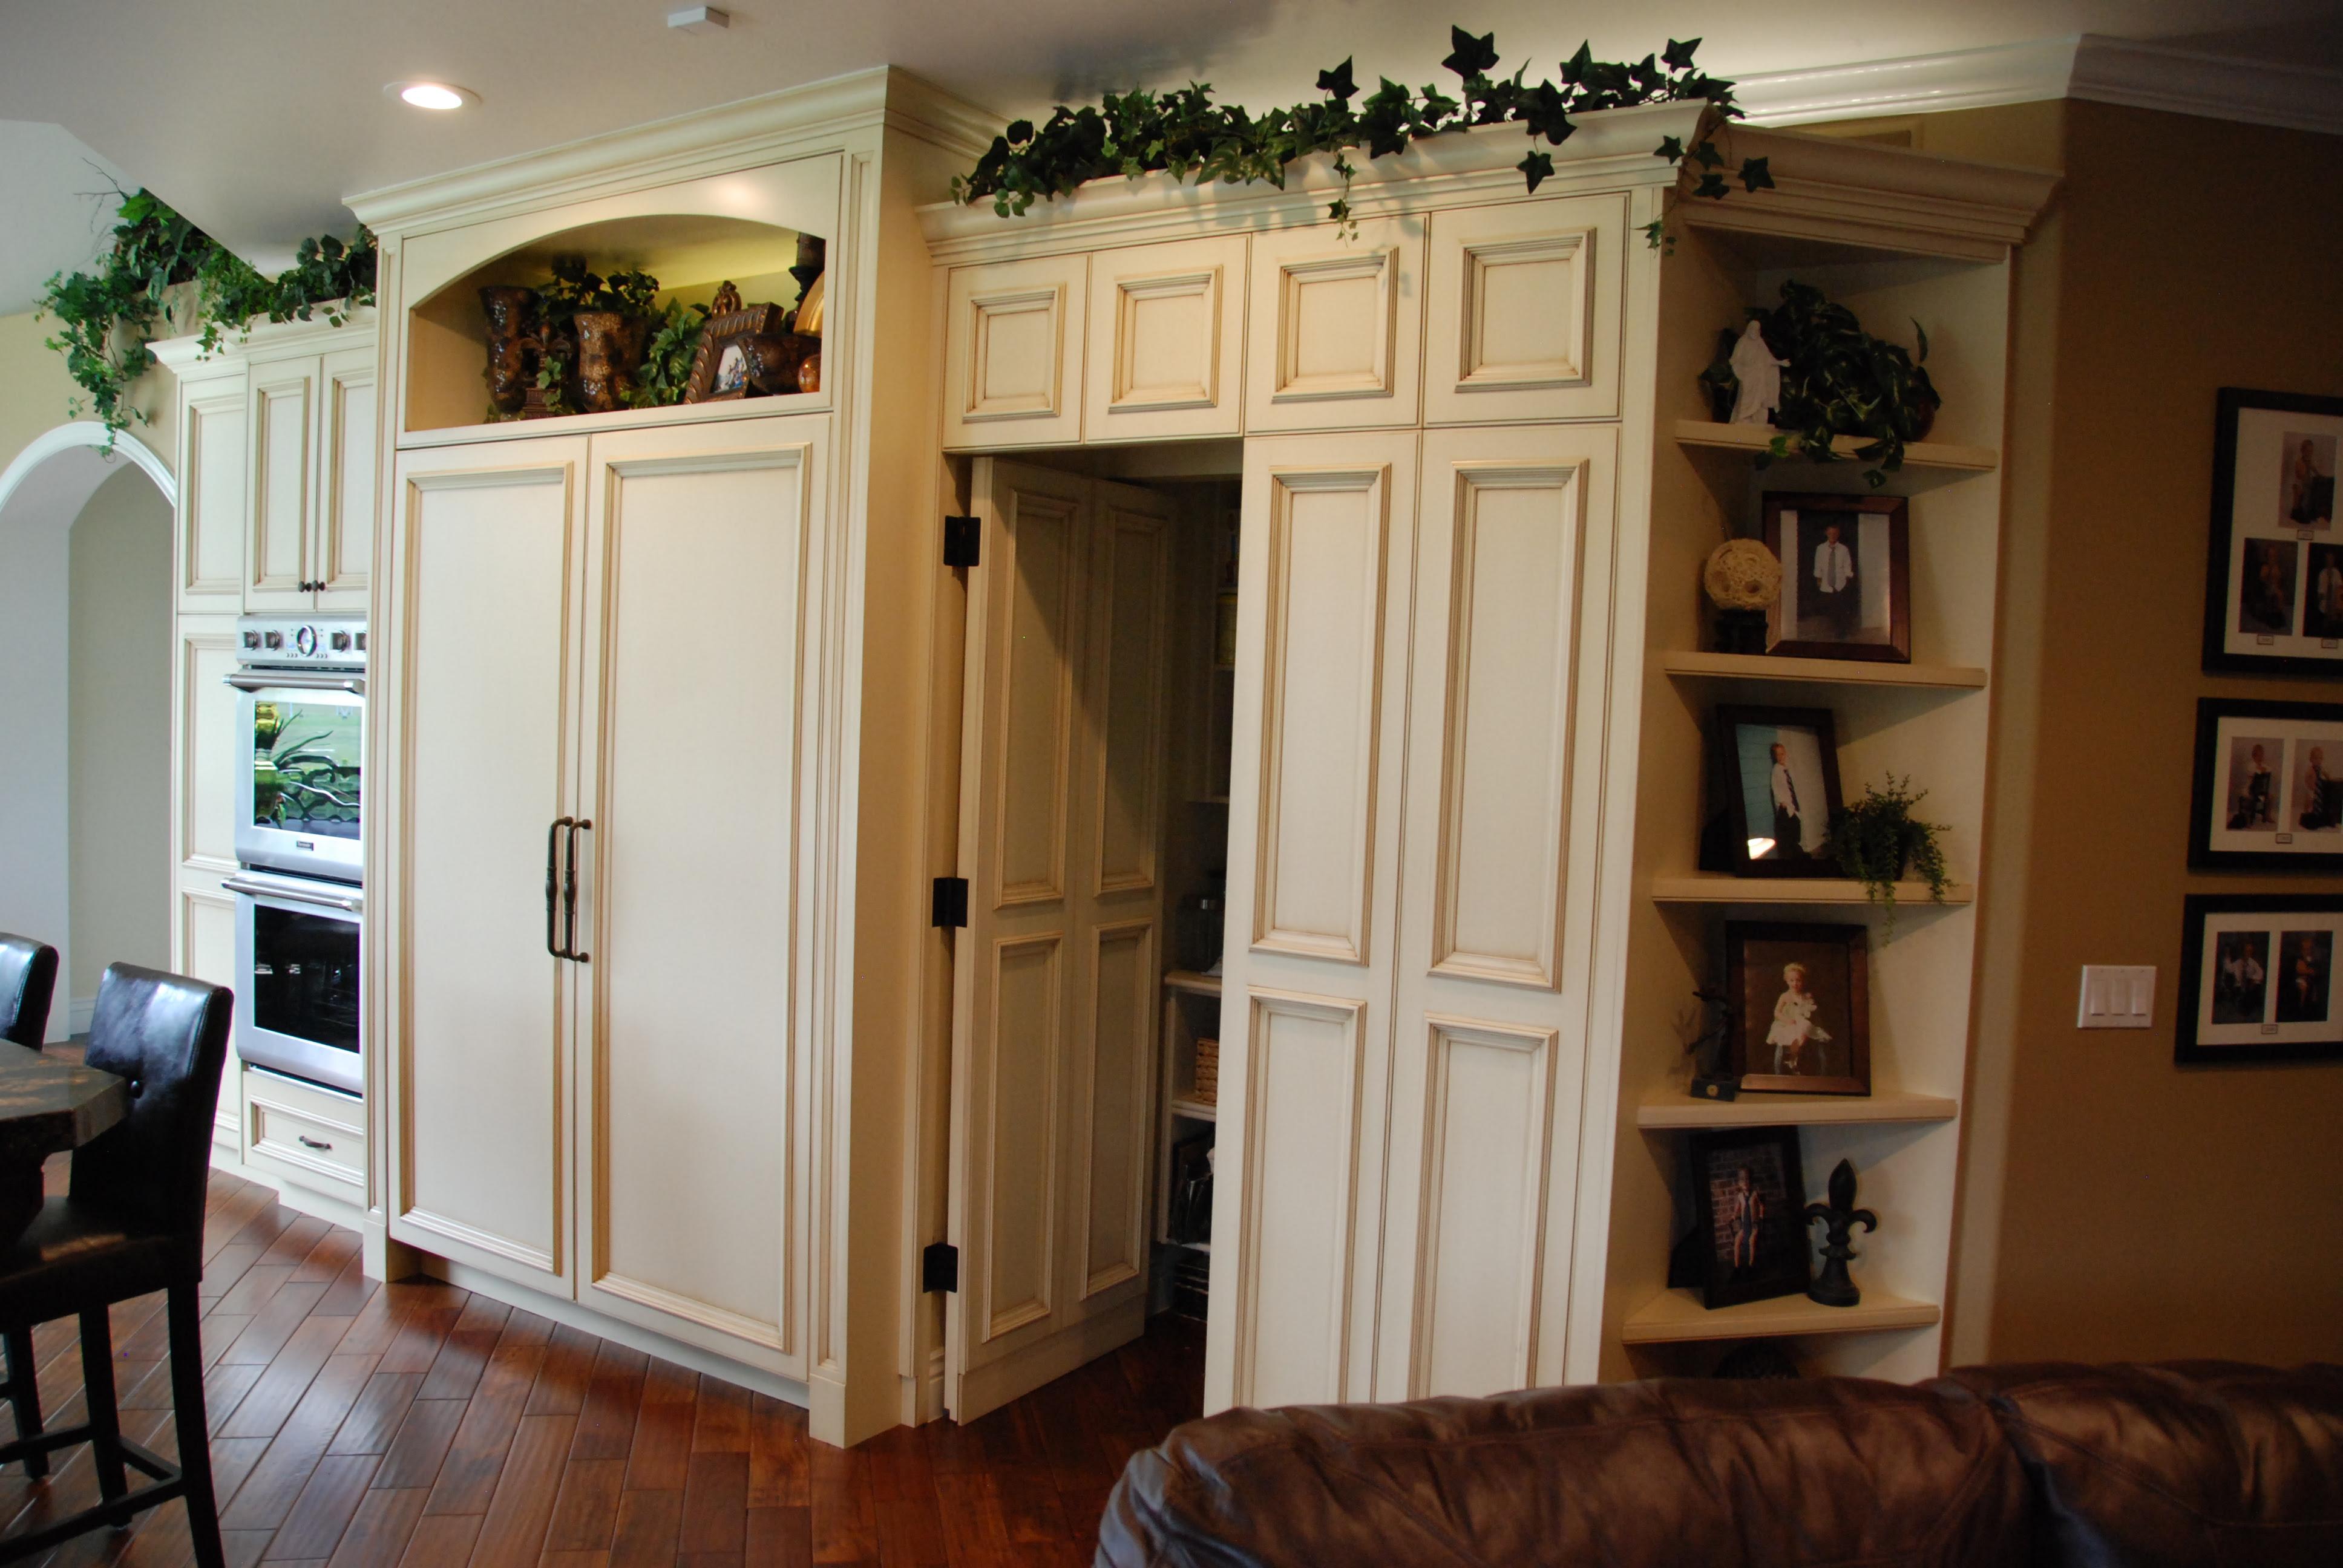 Kitchen Storage Cabinets with Doors